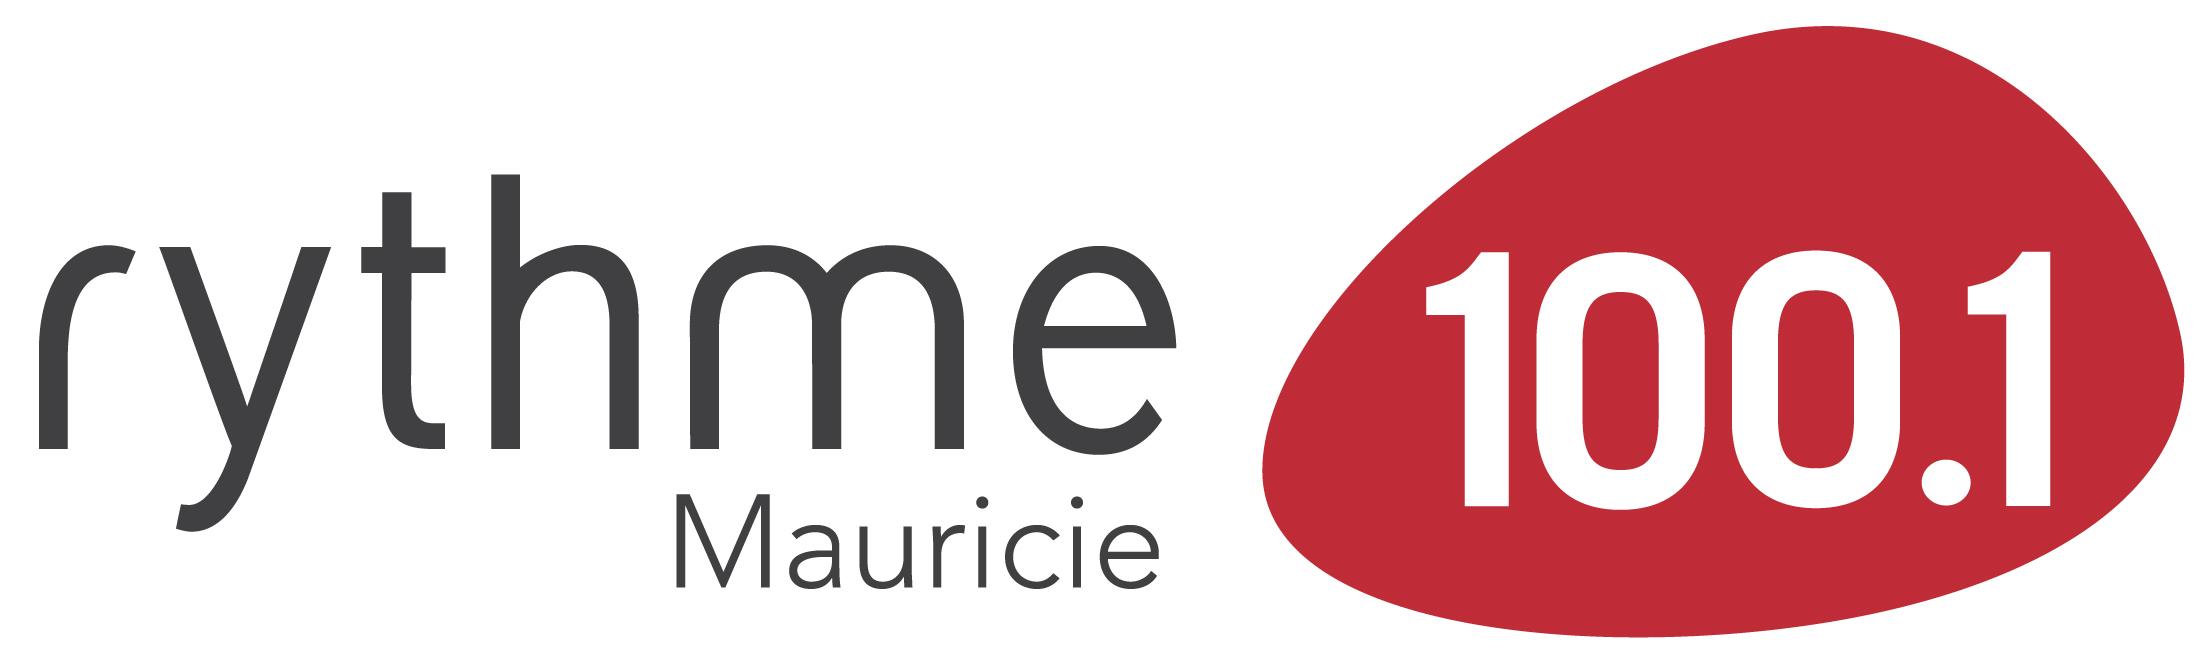 rfm_logo_mauricie_cmyk_2009